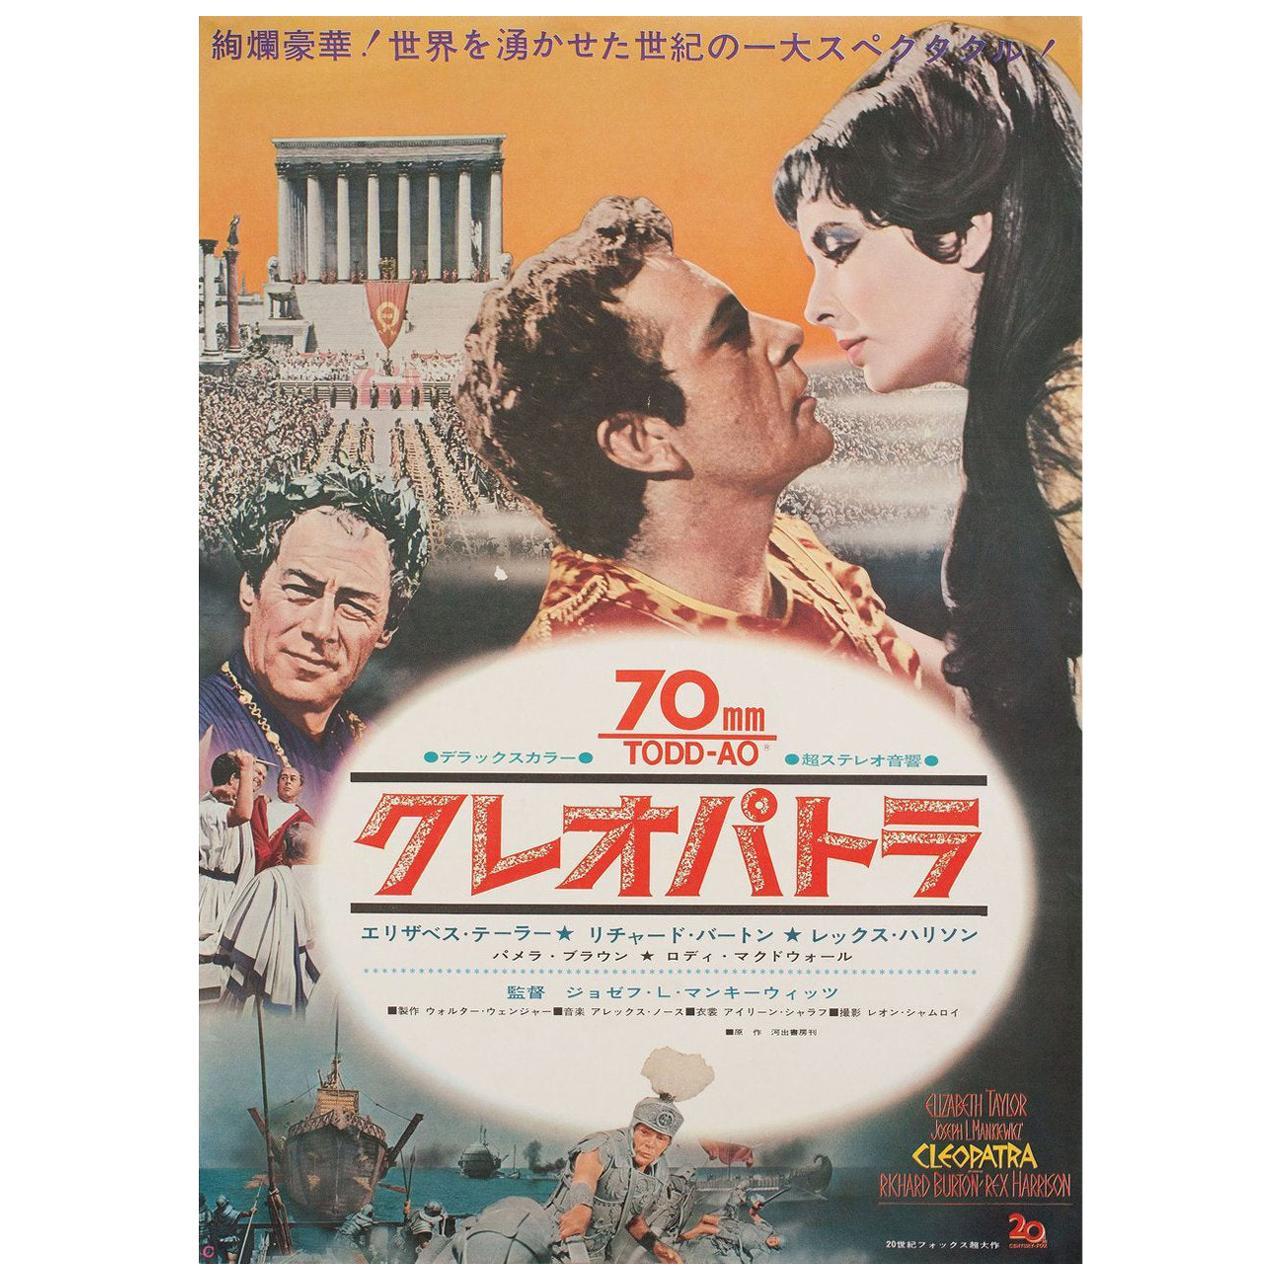 'Cleopatra' 1964 Japanese B2 Film Poster